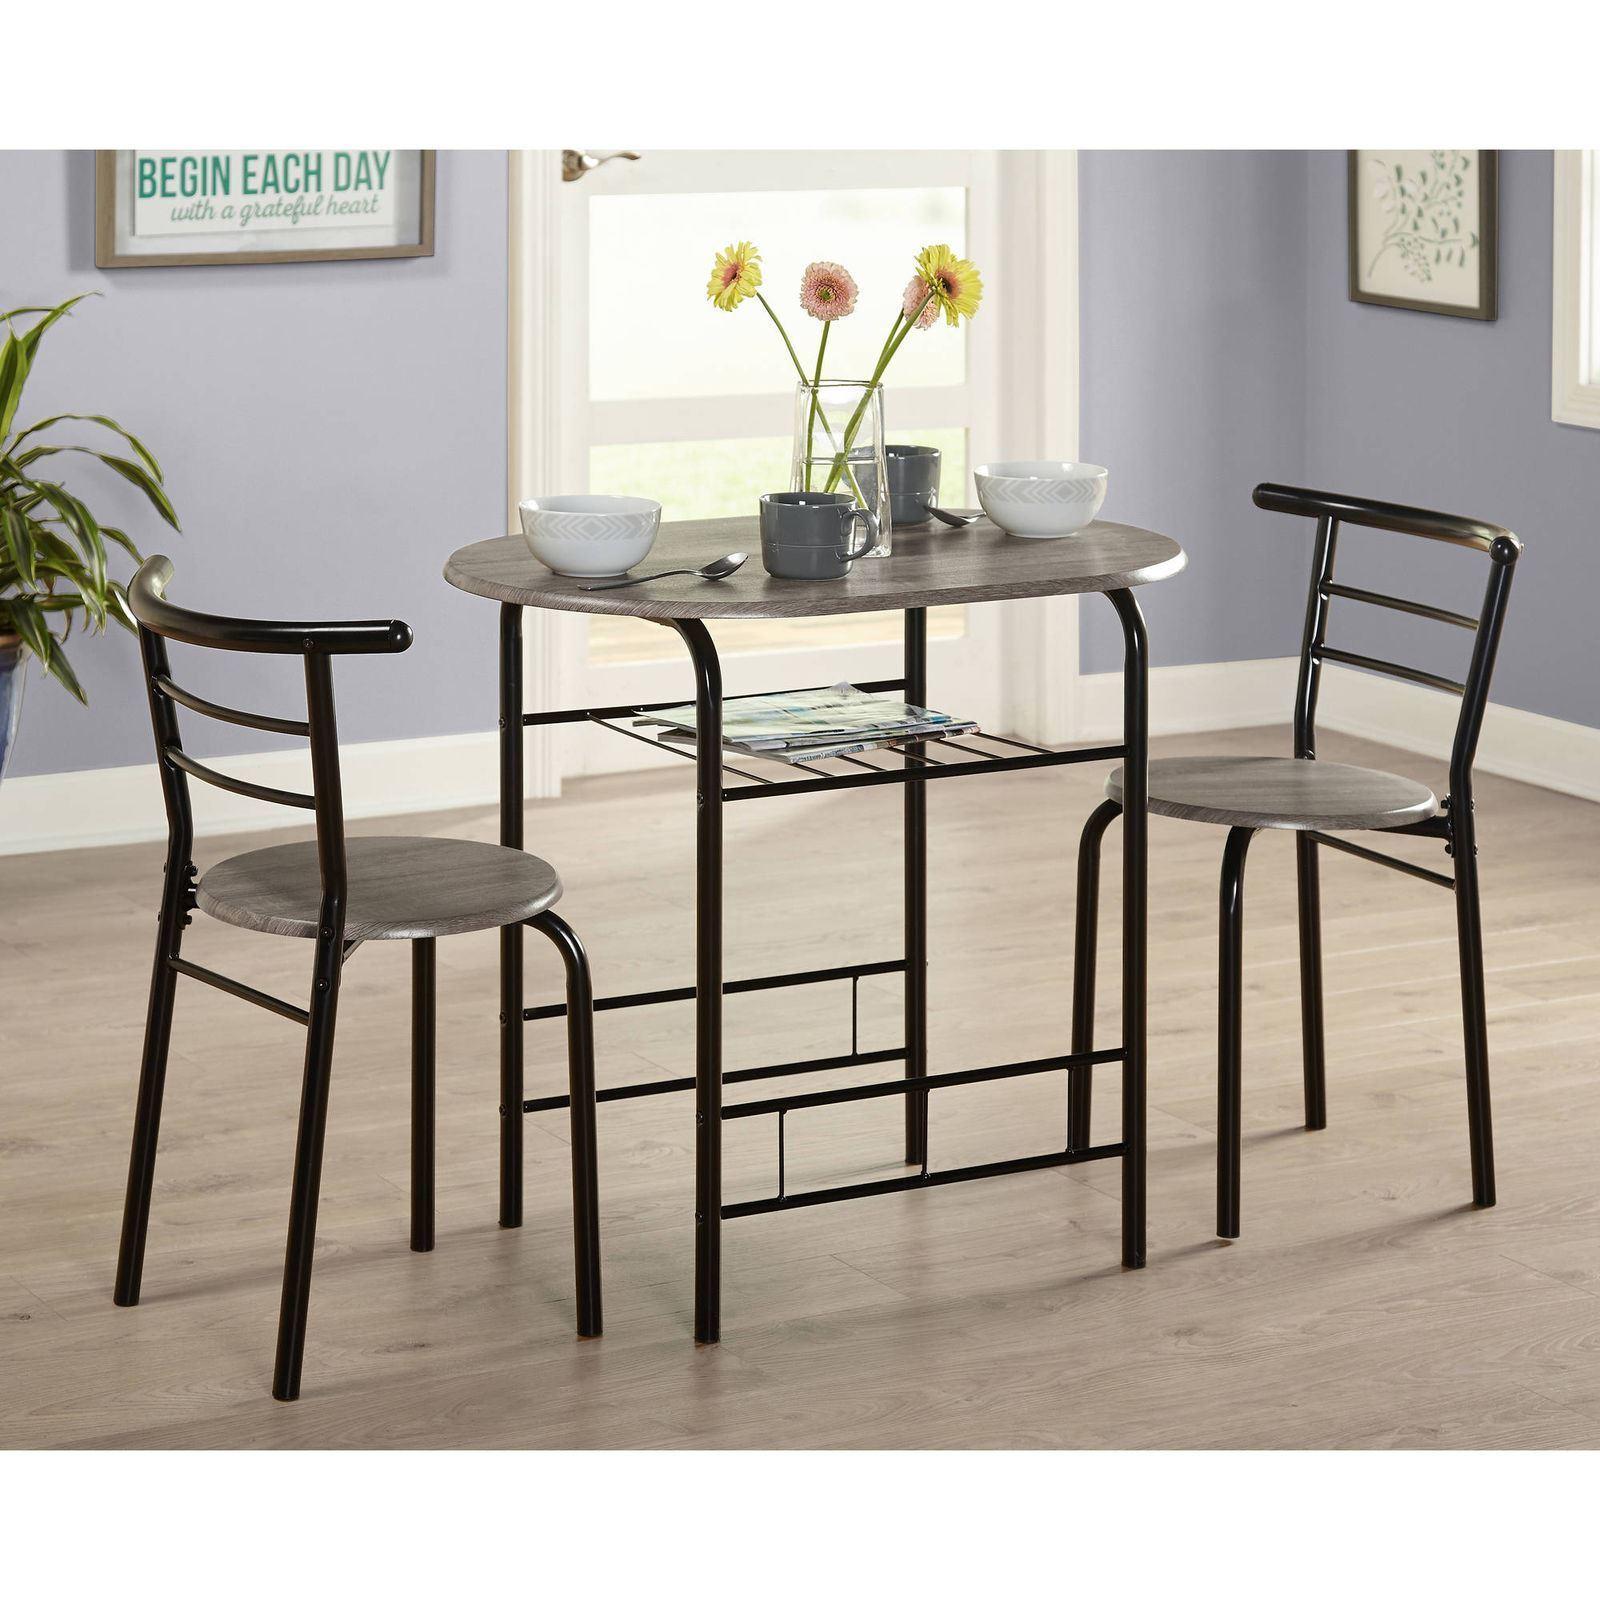 Black Pub Dining Set: Black Gray 3 Pc Dining Table Set Chairs Kitchen Bistro